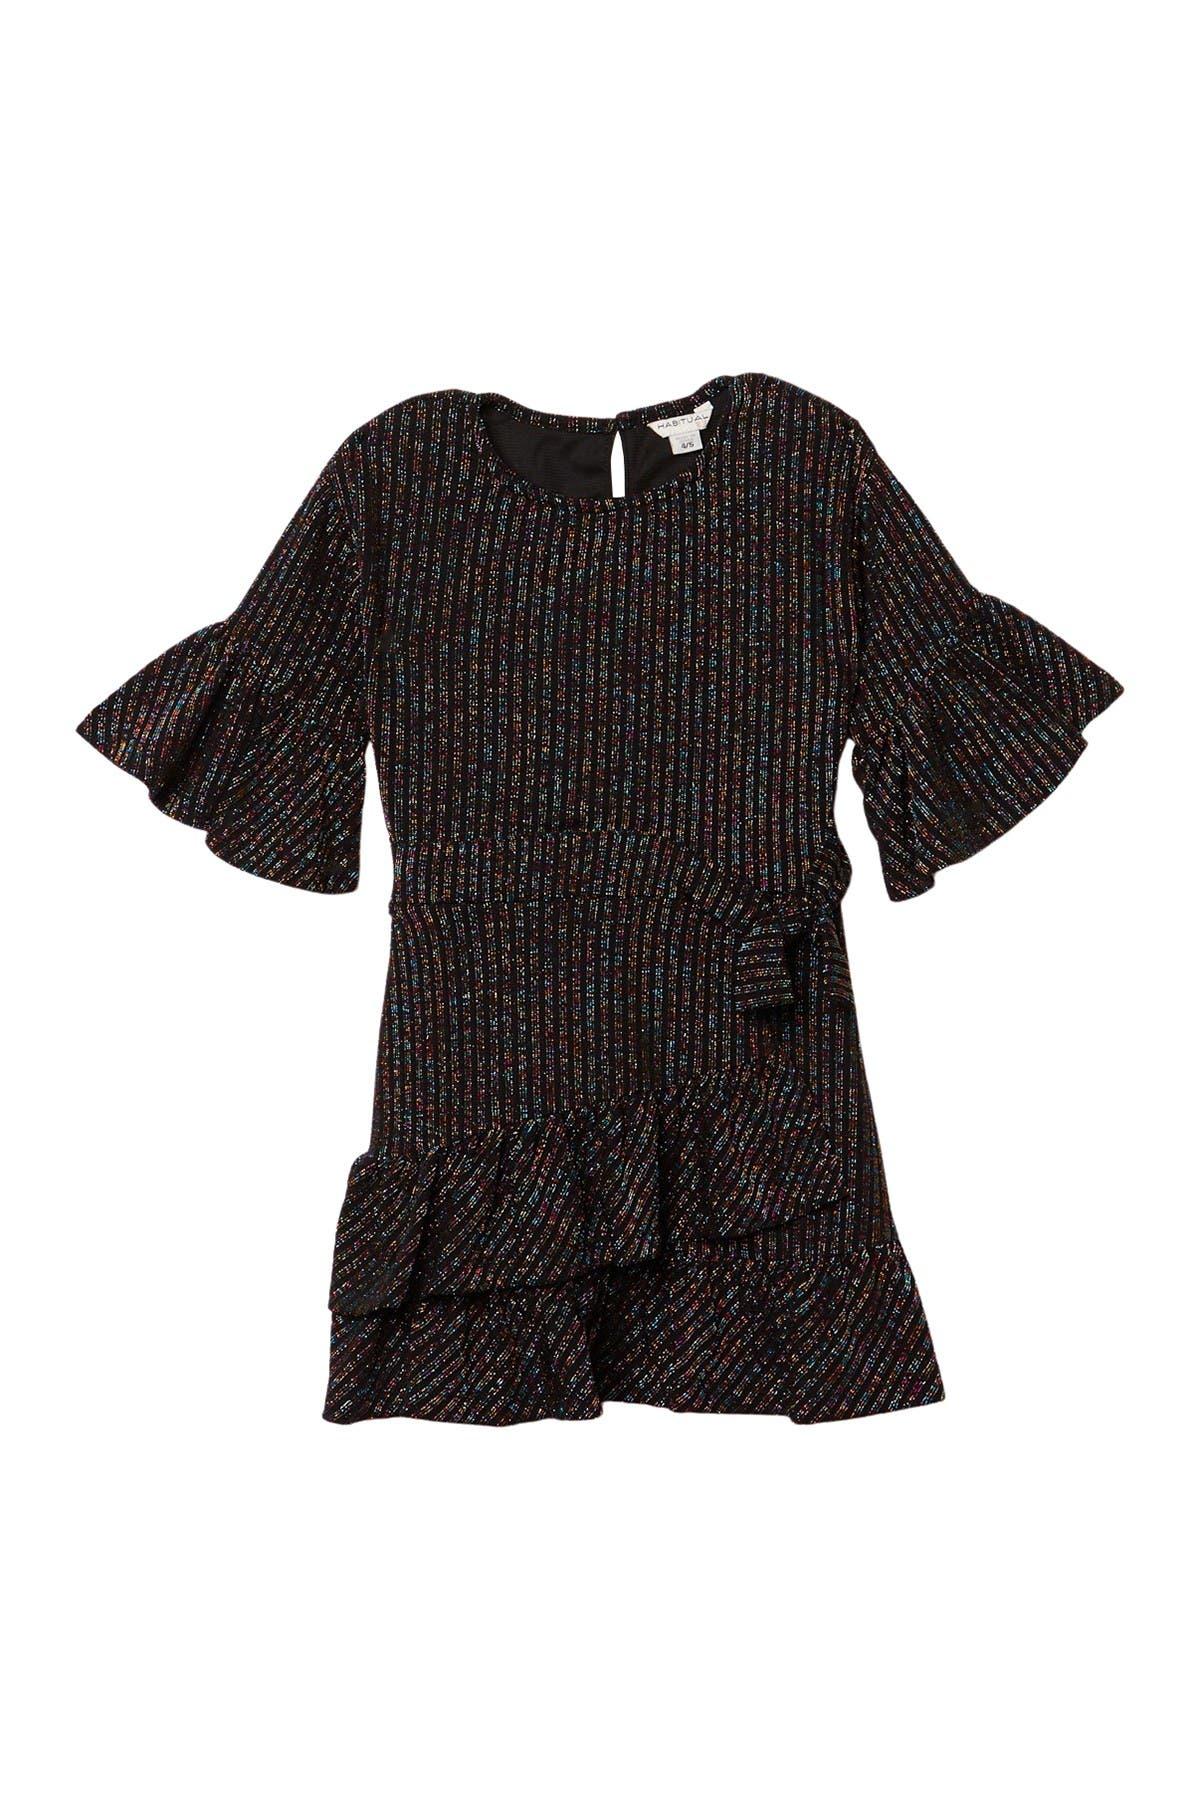 Image of Habitual Remy Knit Rainbow Wrap Dress